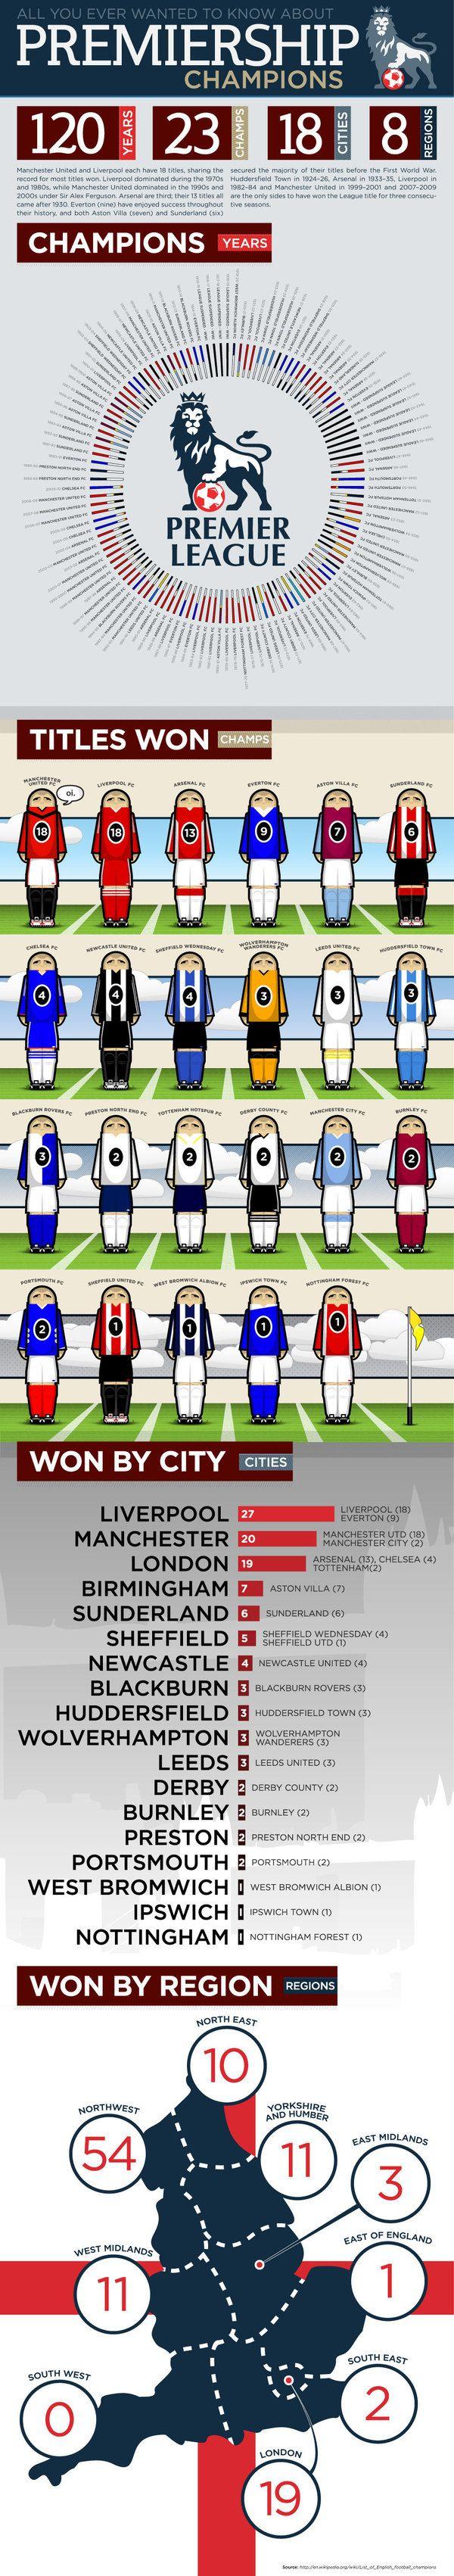 Infographic on Premier League winners stats. #infogr8 #infographic #dataviz